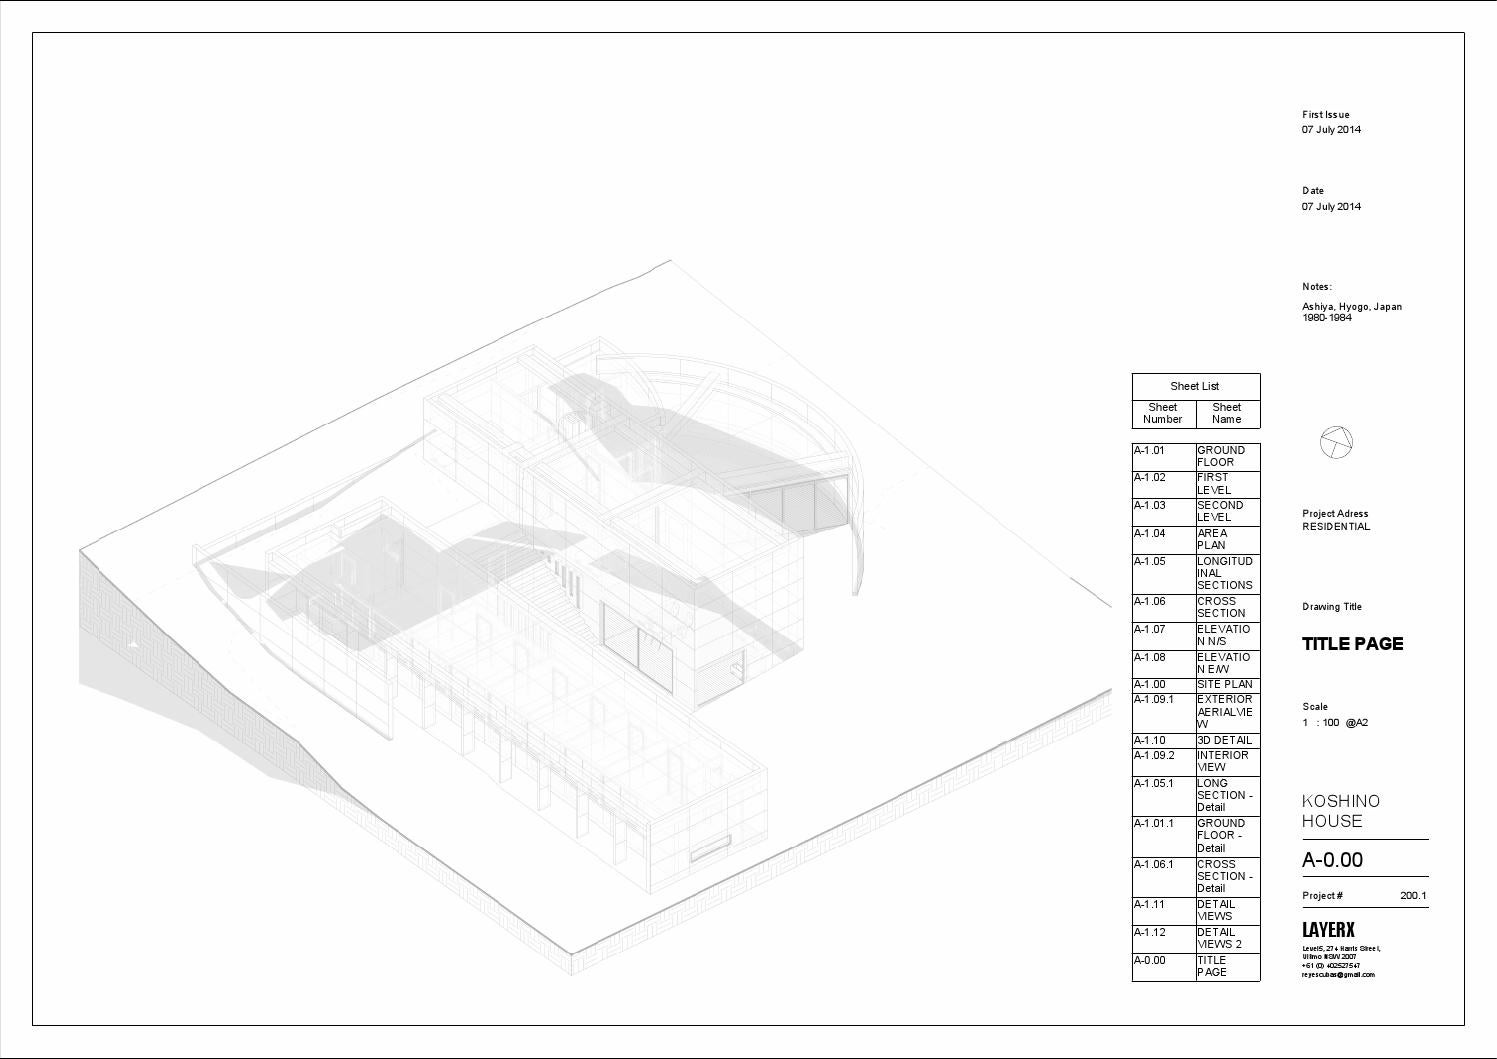 KOSHINO HOUSE by scar Reyes issuu – Koshino House Floor Plan